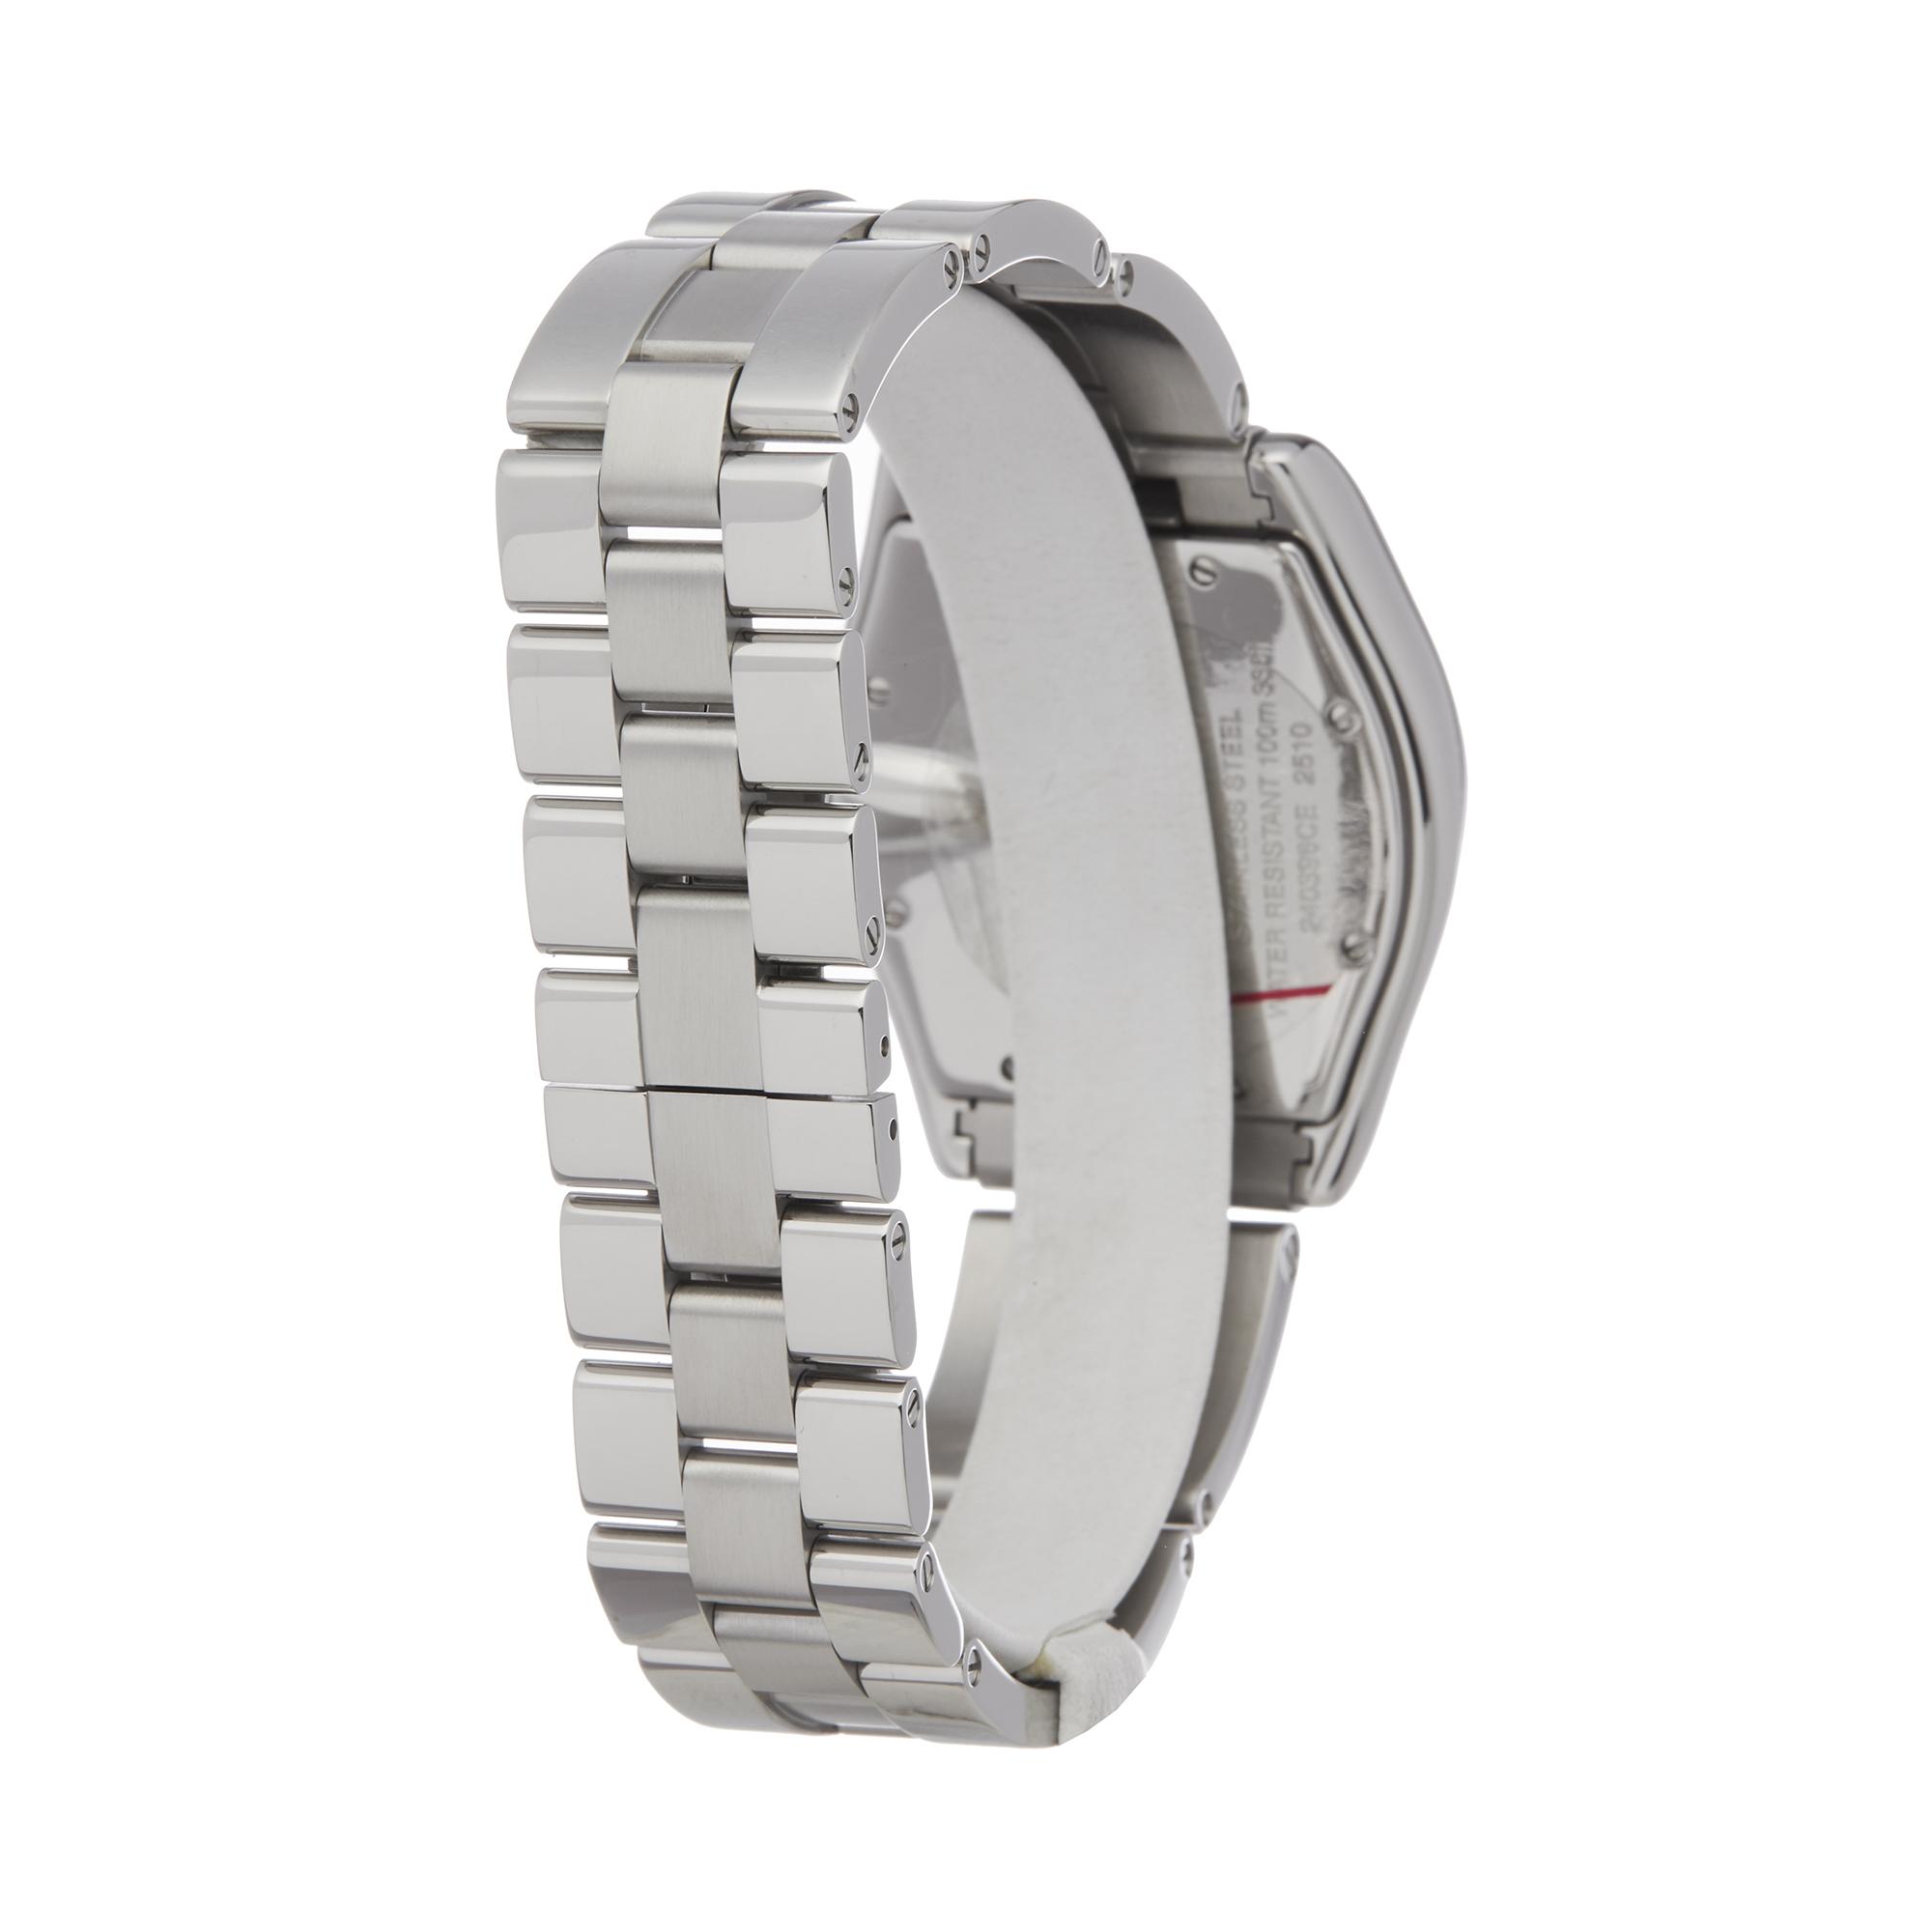 Cartier Roadster 2510 Men Stainless Steel Watch - Image 5 of 8